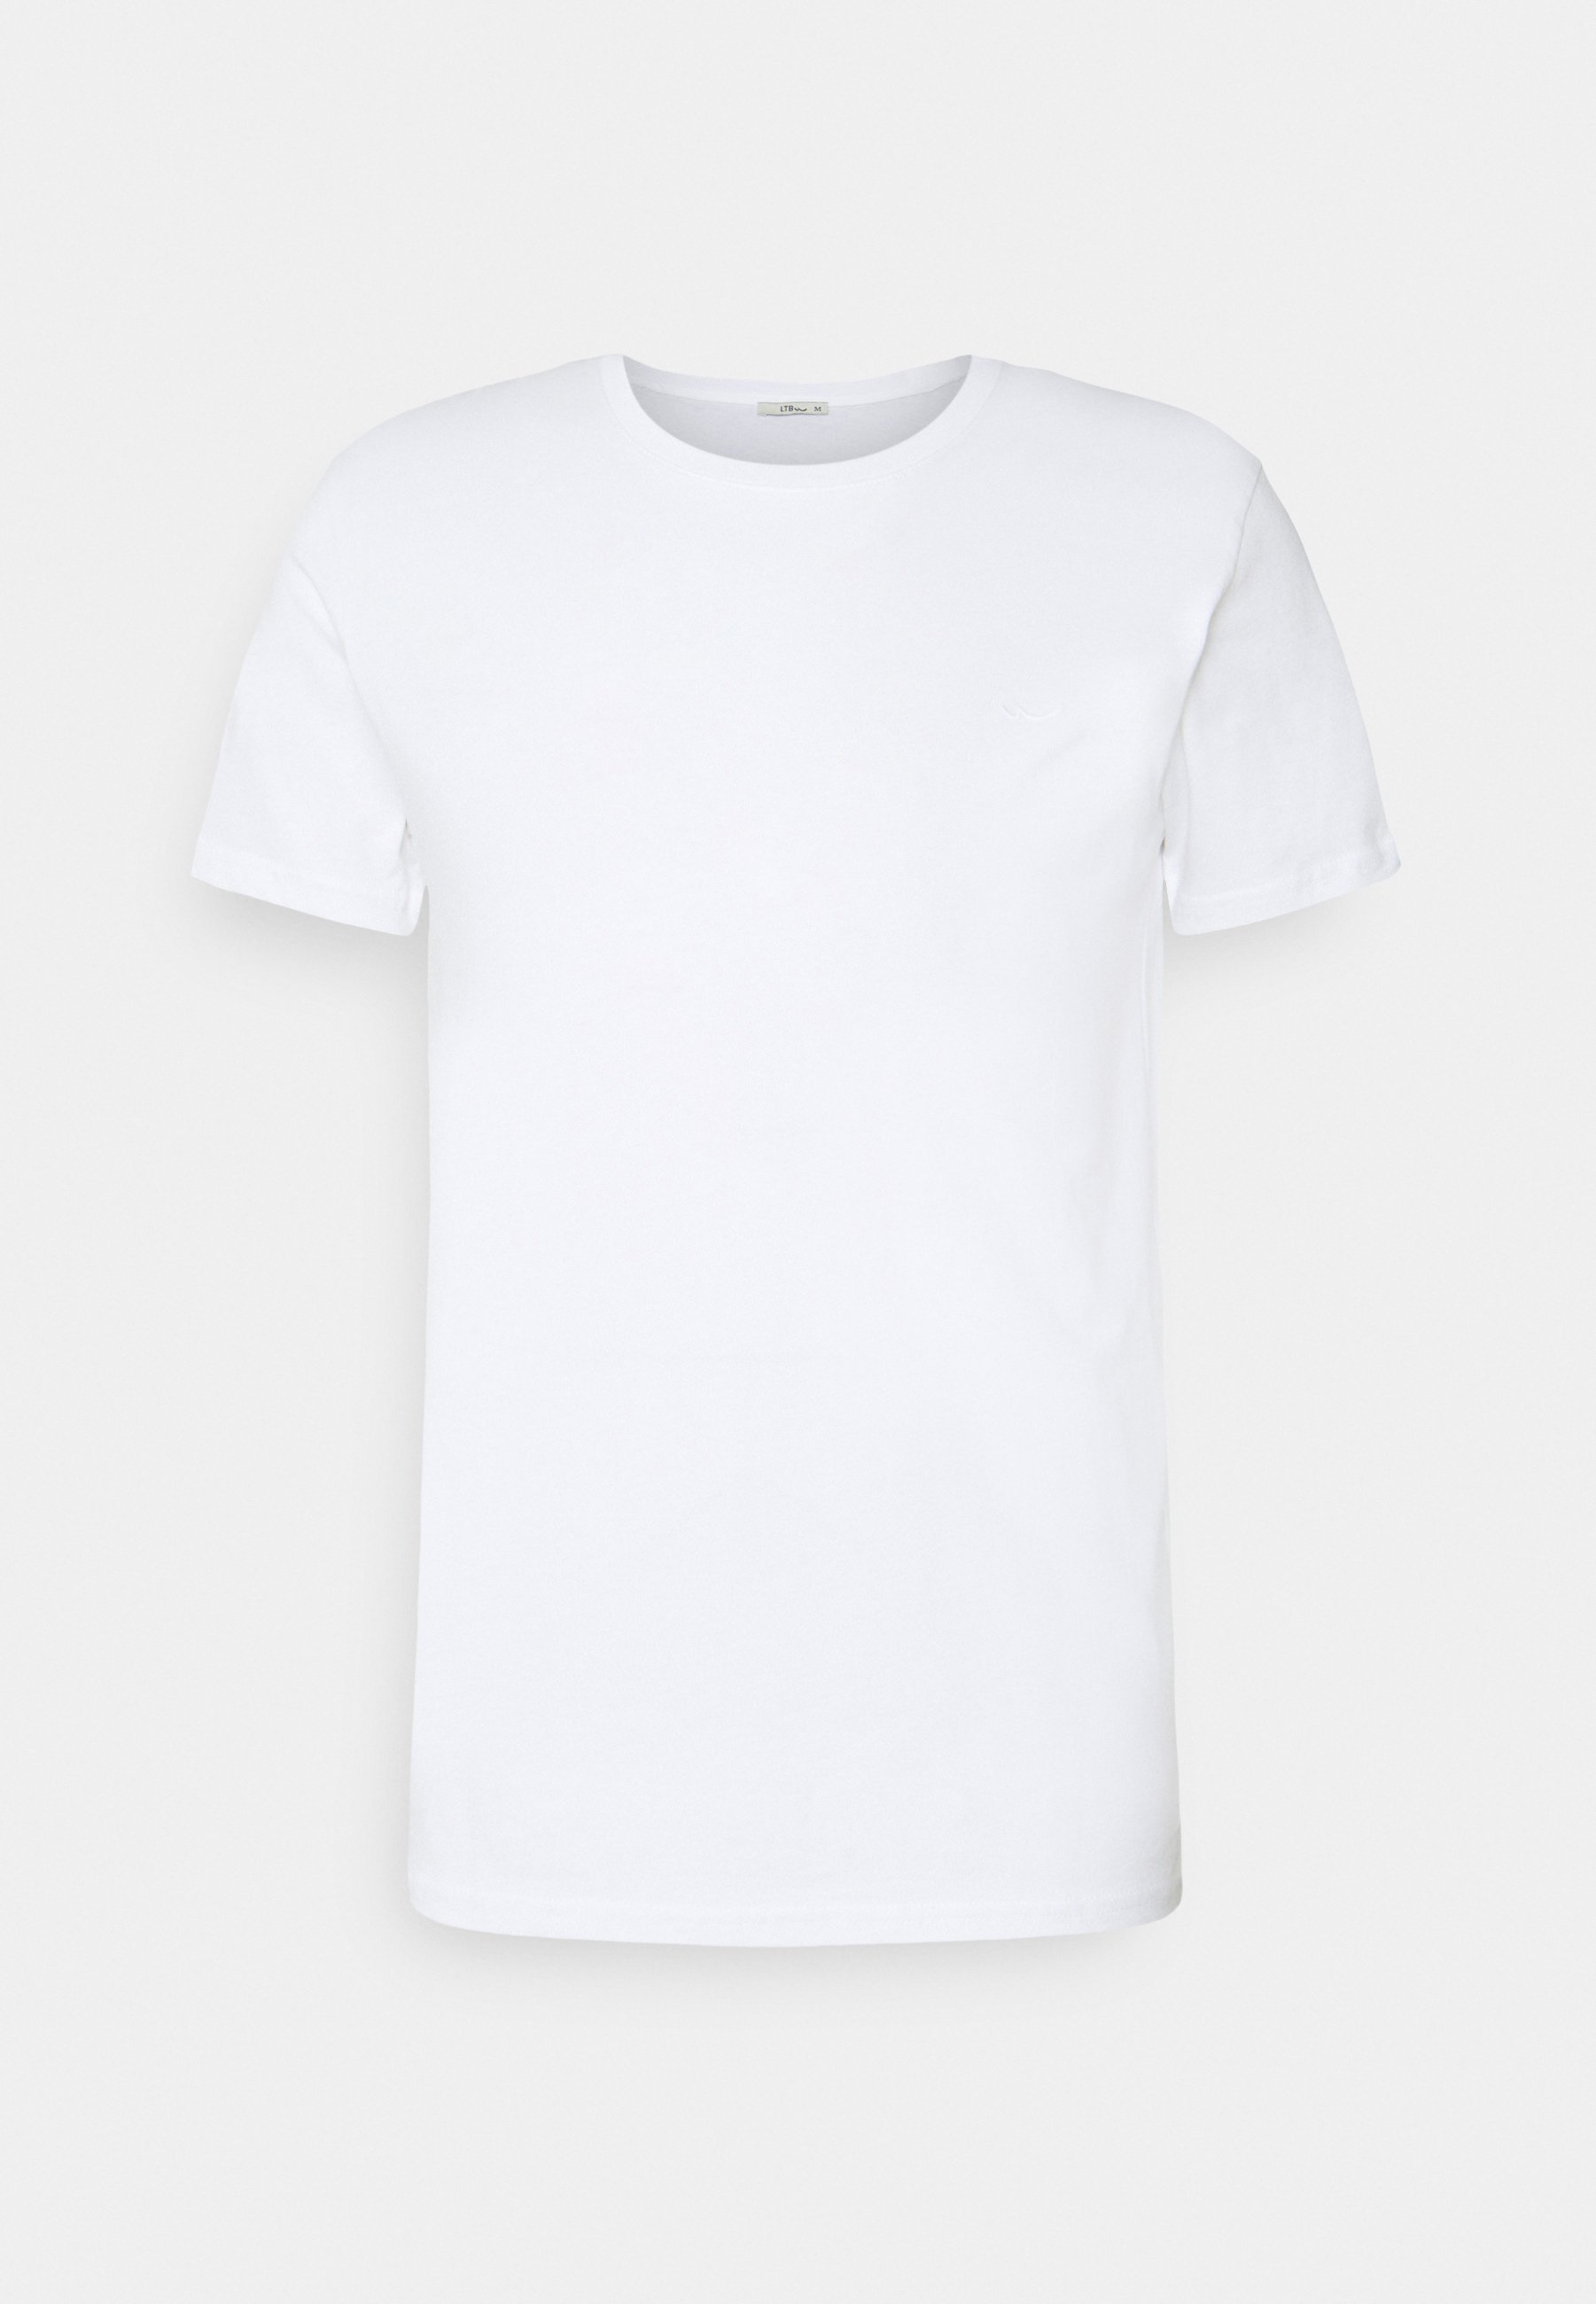 Ltb 3 Pack - T-shirts Black/grey Melange/white/svart